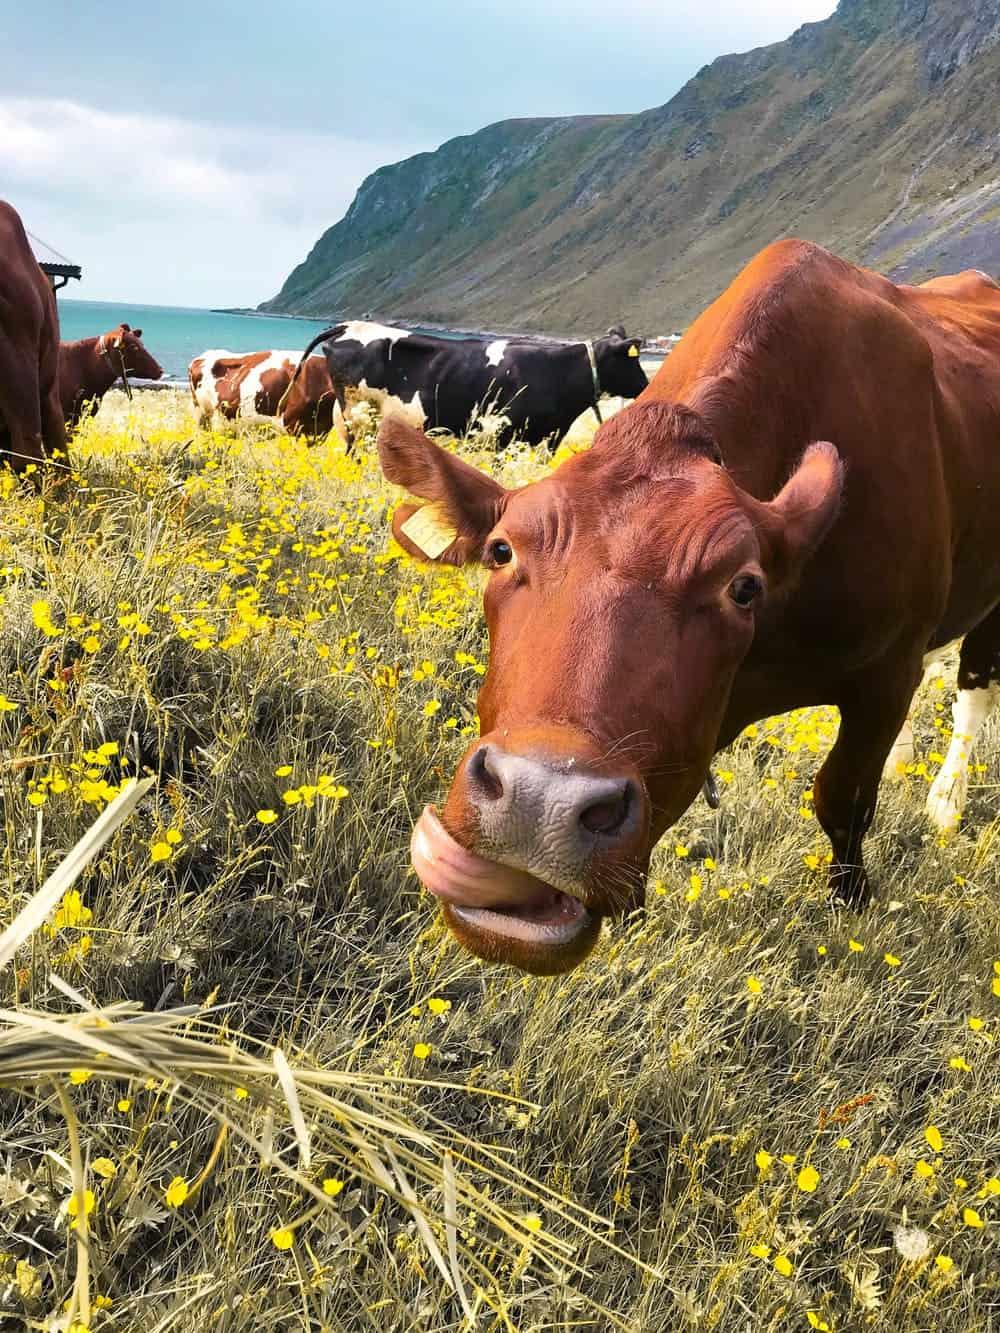 Rottweiler cow herding dog